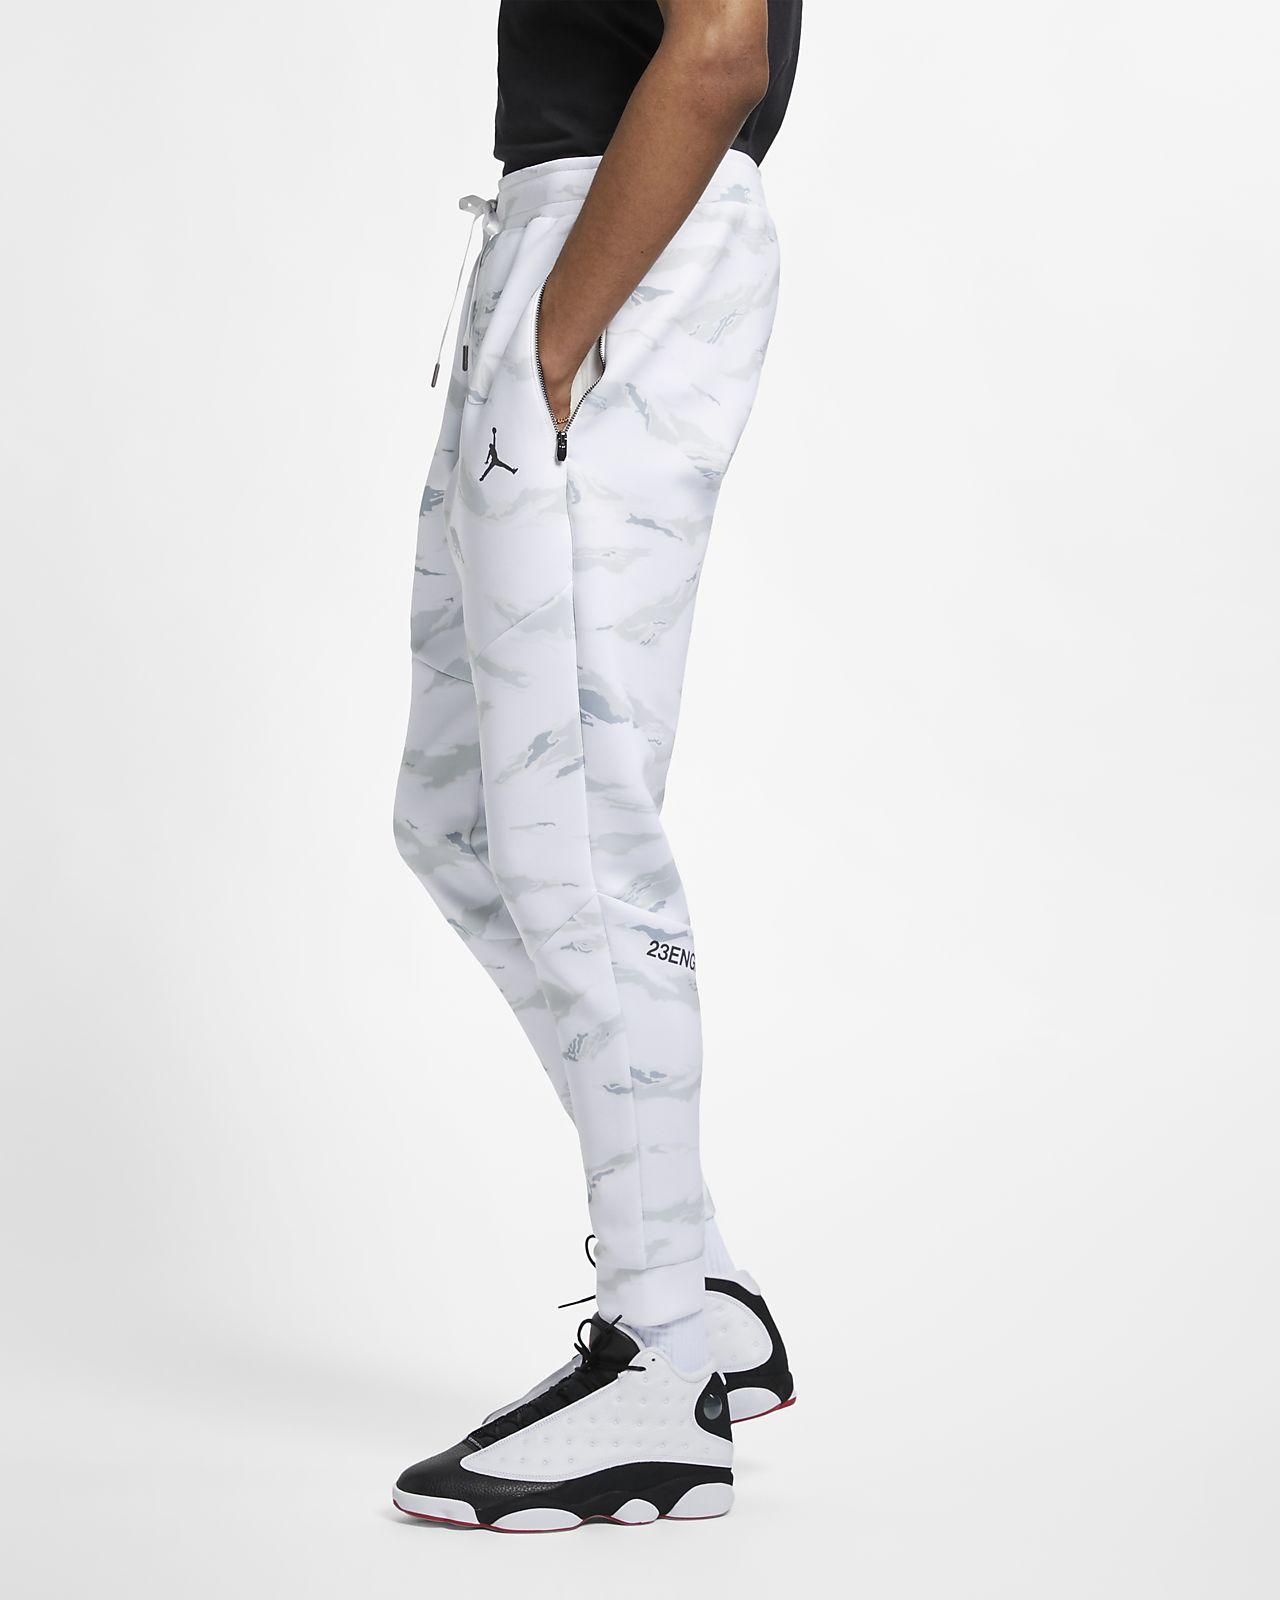 new product d718e b1853 ... Pantalon camouflage Jordan Sportswear Flight Tech pour Homme